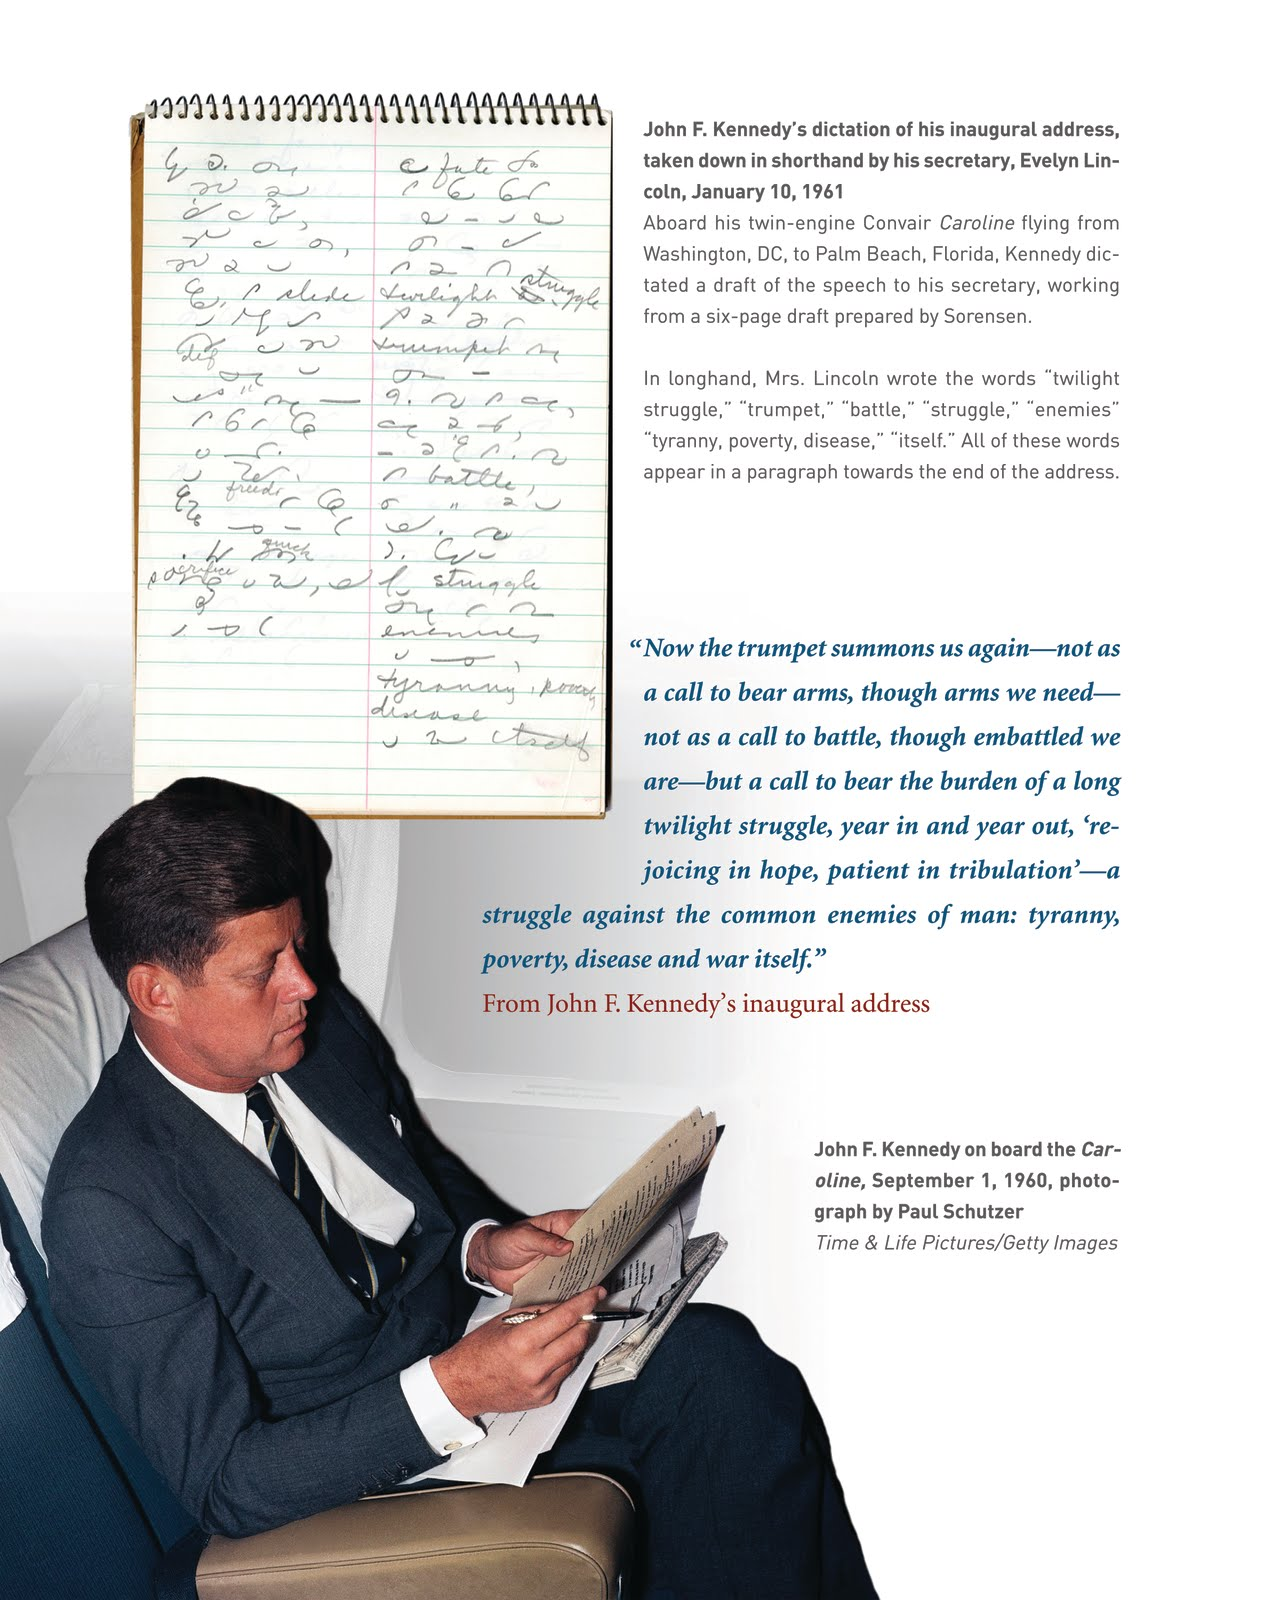 Kennedydetail History Of John F Kennedy S Inaugural Address